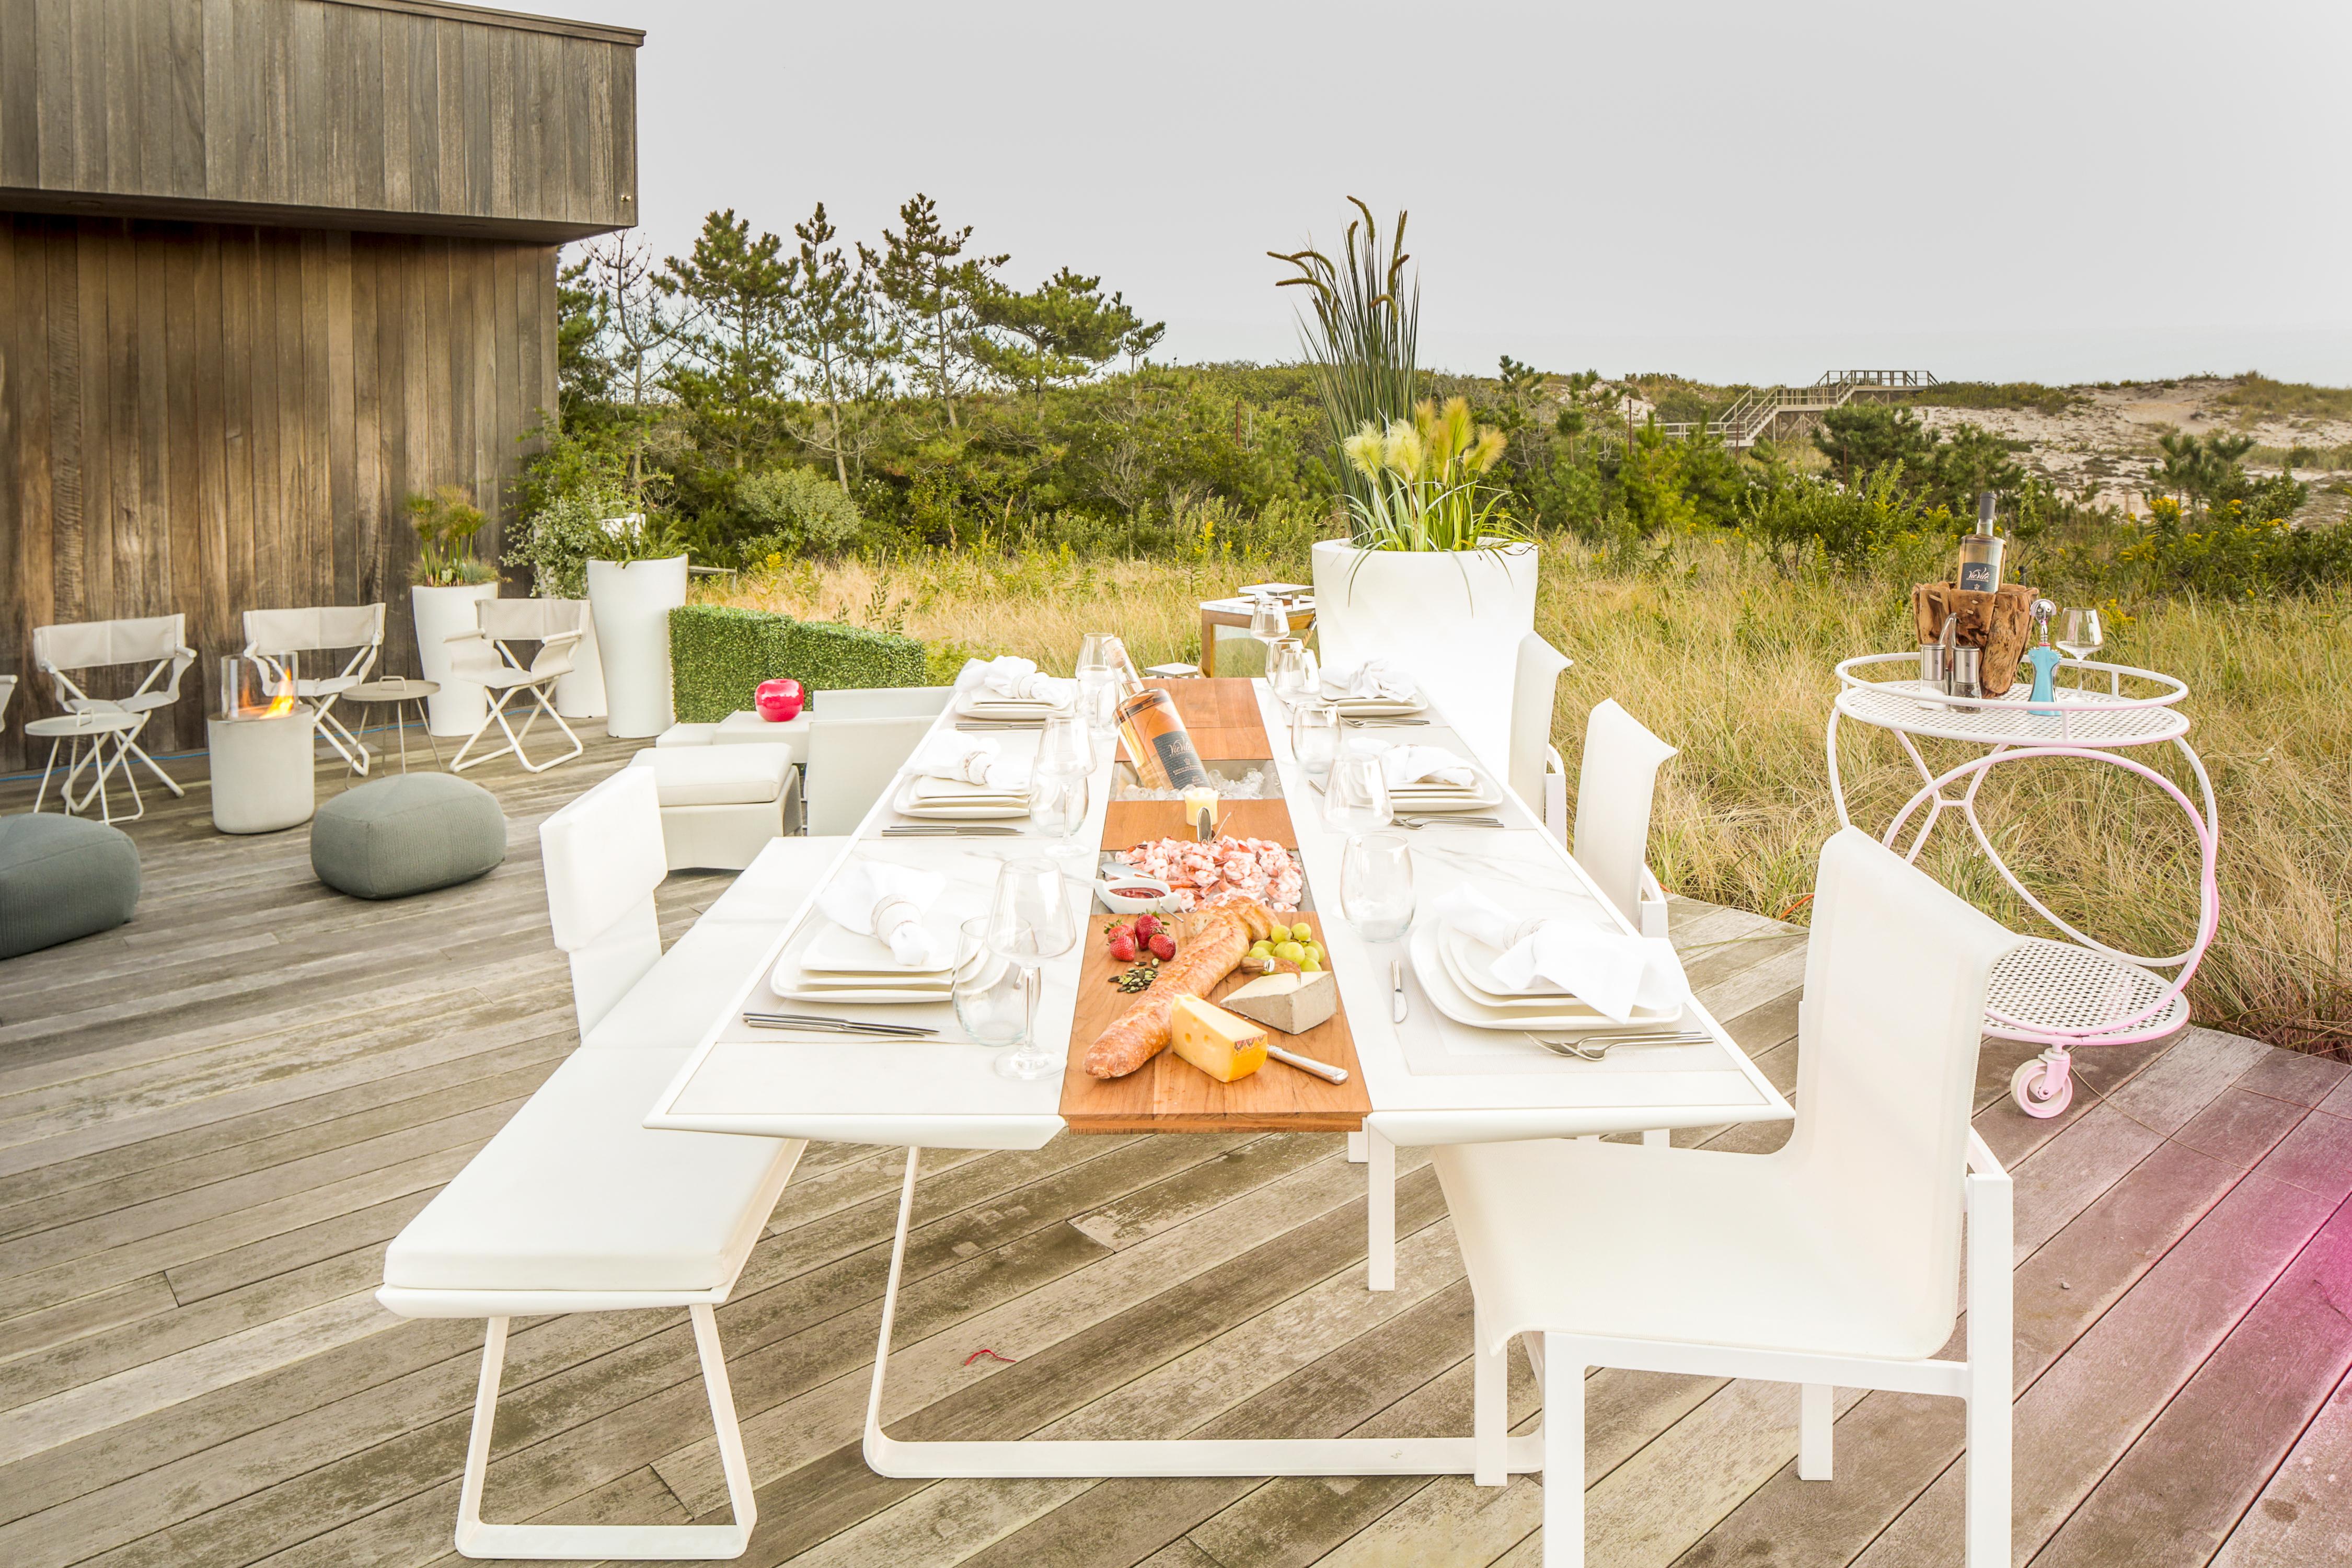 1100 1100c_grande_dame_modular_champagne_dining_table.  1100 1100e_grande_dame_modular_champagne_dining_table. Grande Dame Details